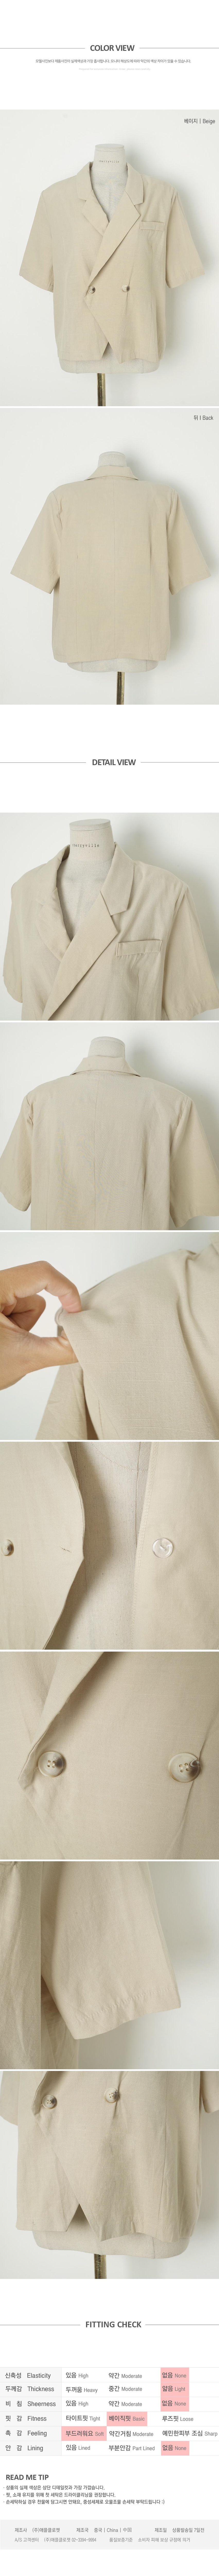 Classic Double Short Jacket